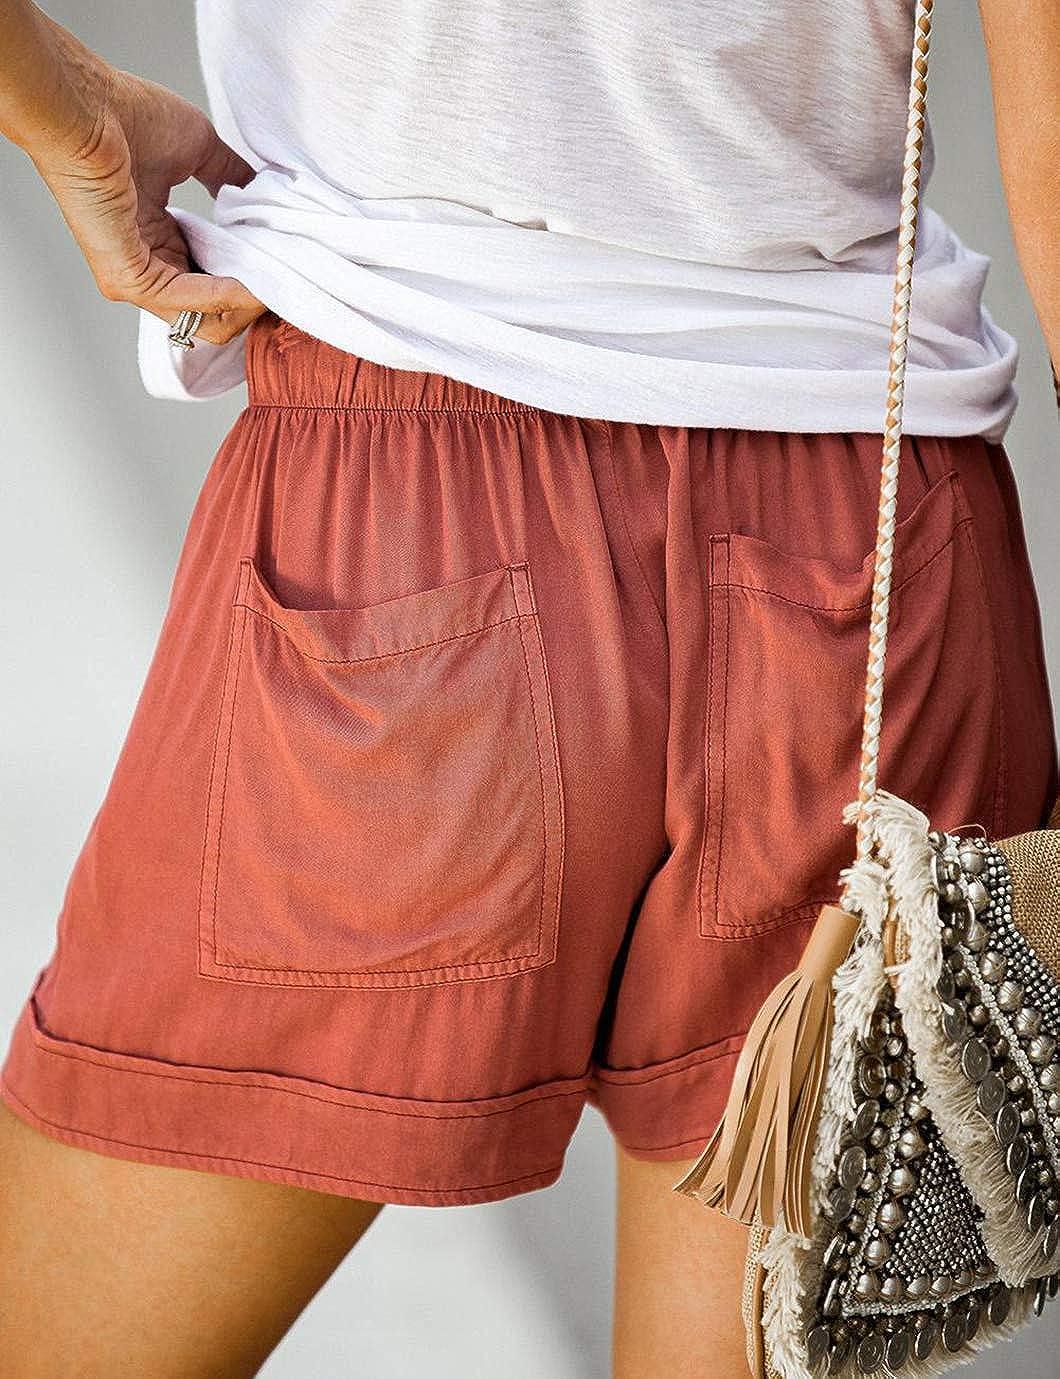 Eddoyee Women Casual Solid Color Shorts Loose Elastic Waist Pants Summer Vacation